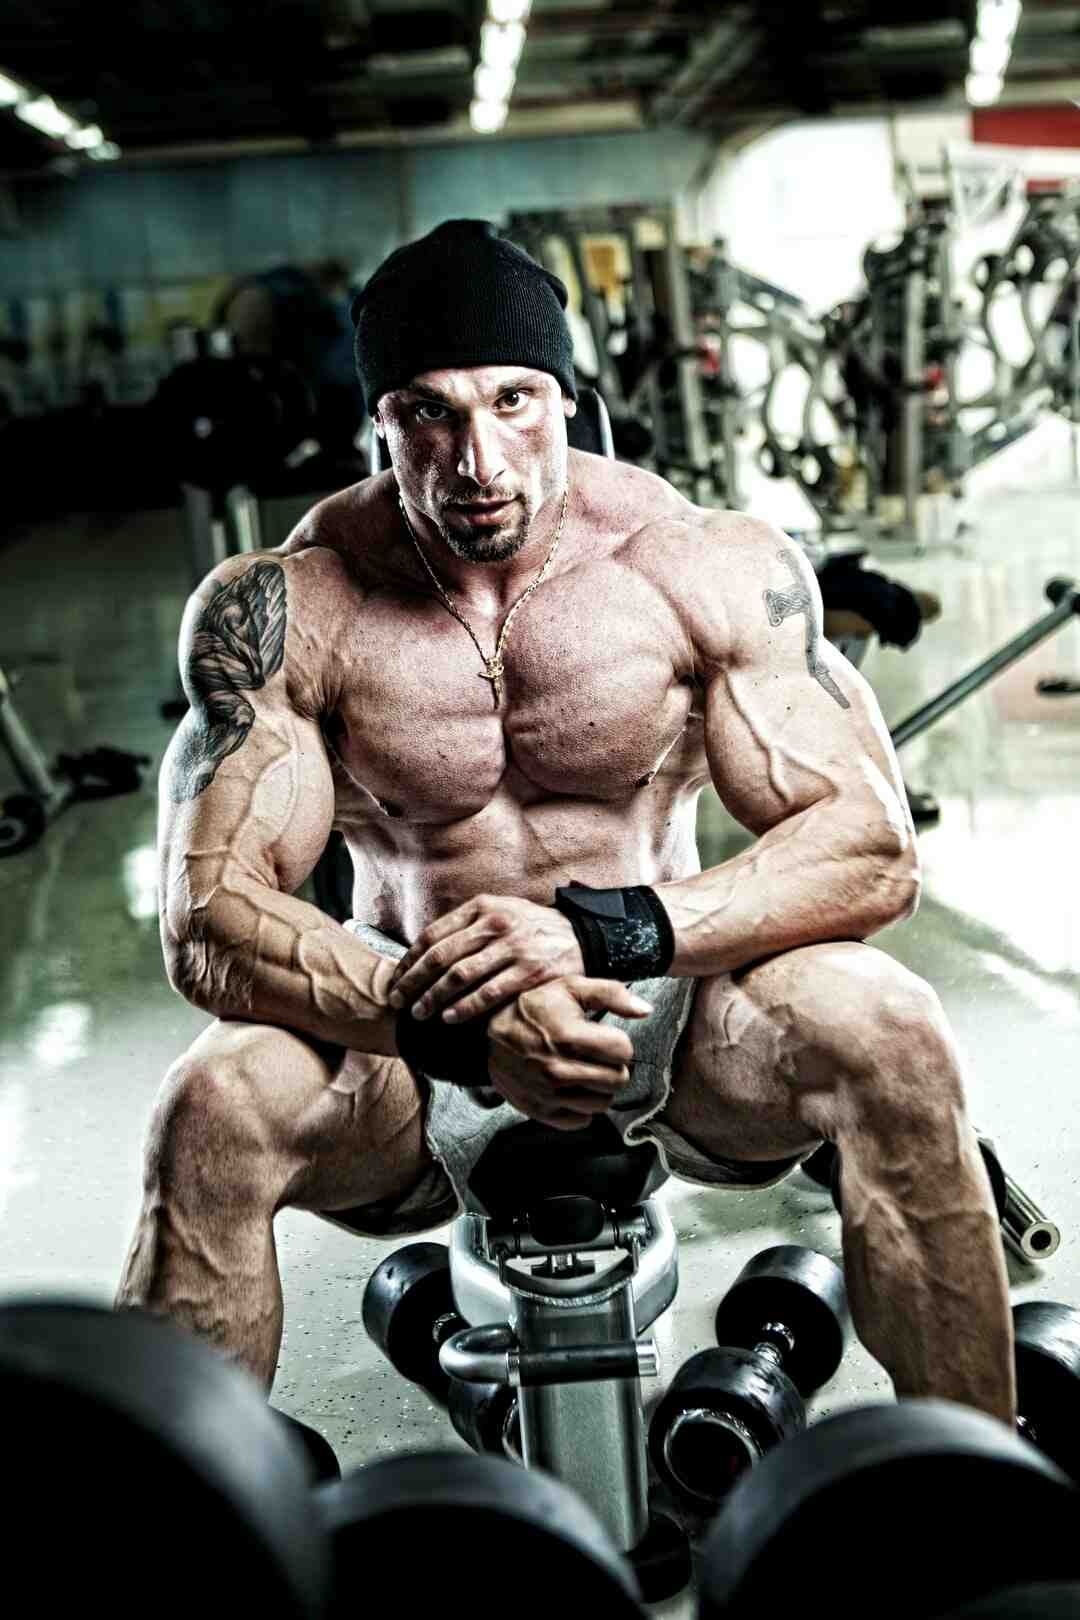 Programme musculation haut du corps